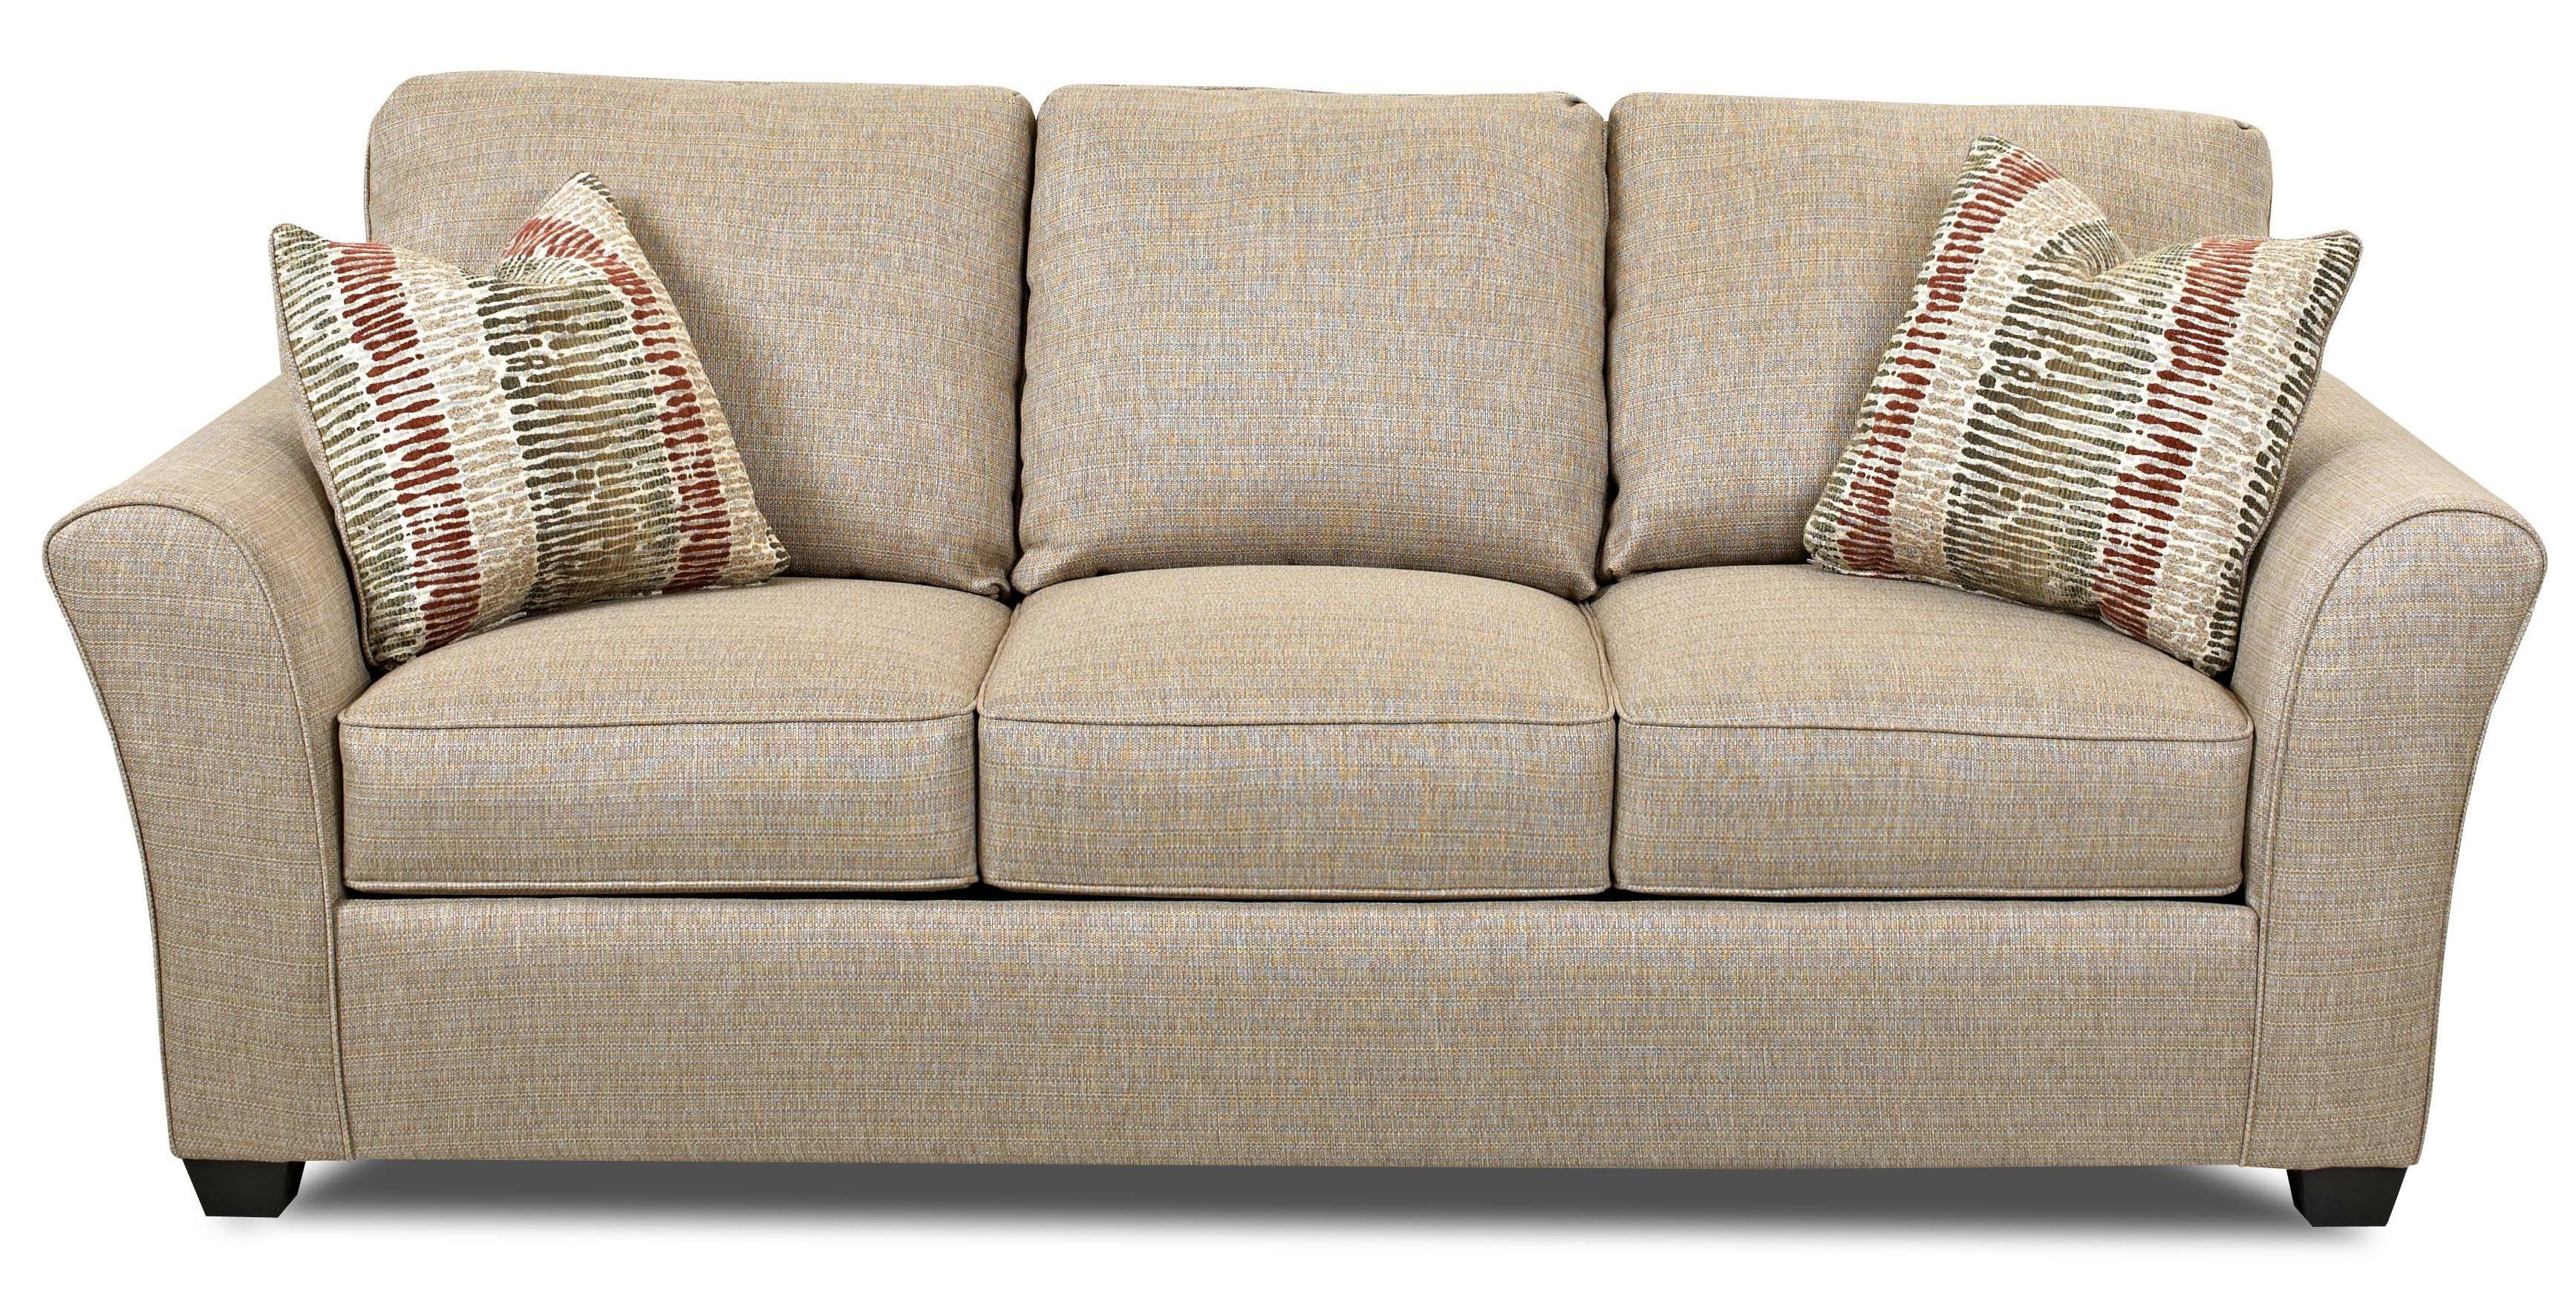 Sedgewick Transitional Sofa by Simple Elegance